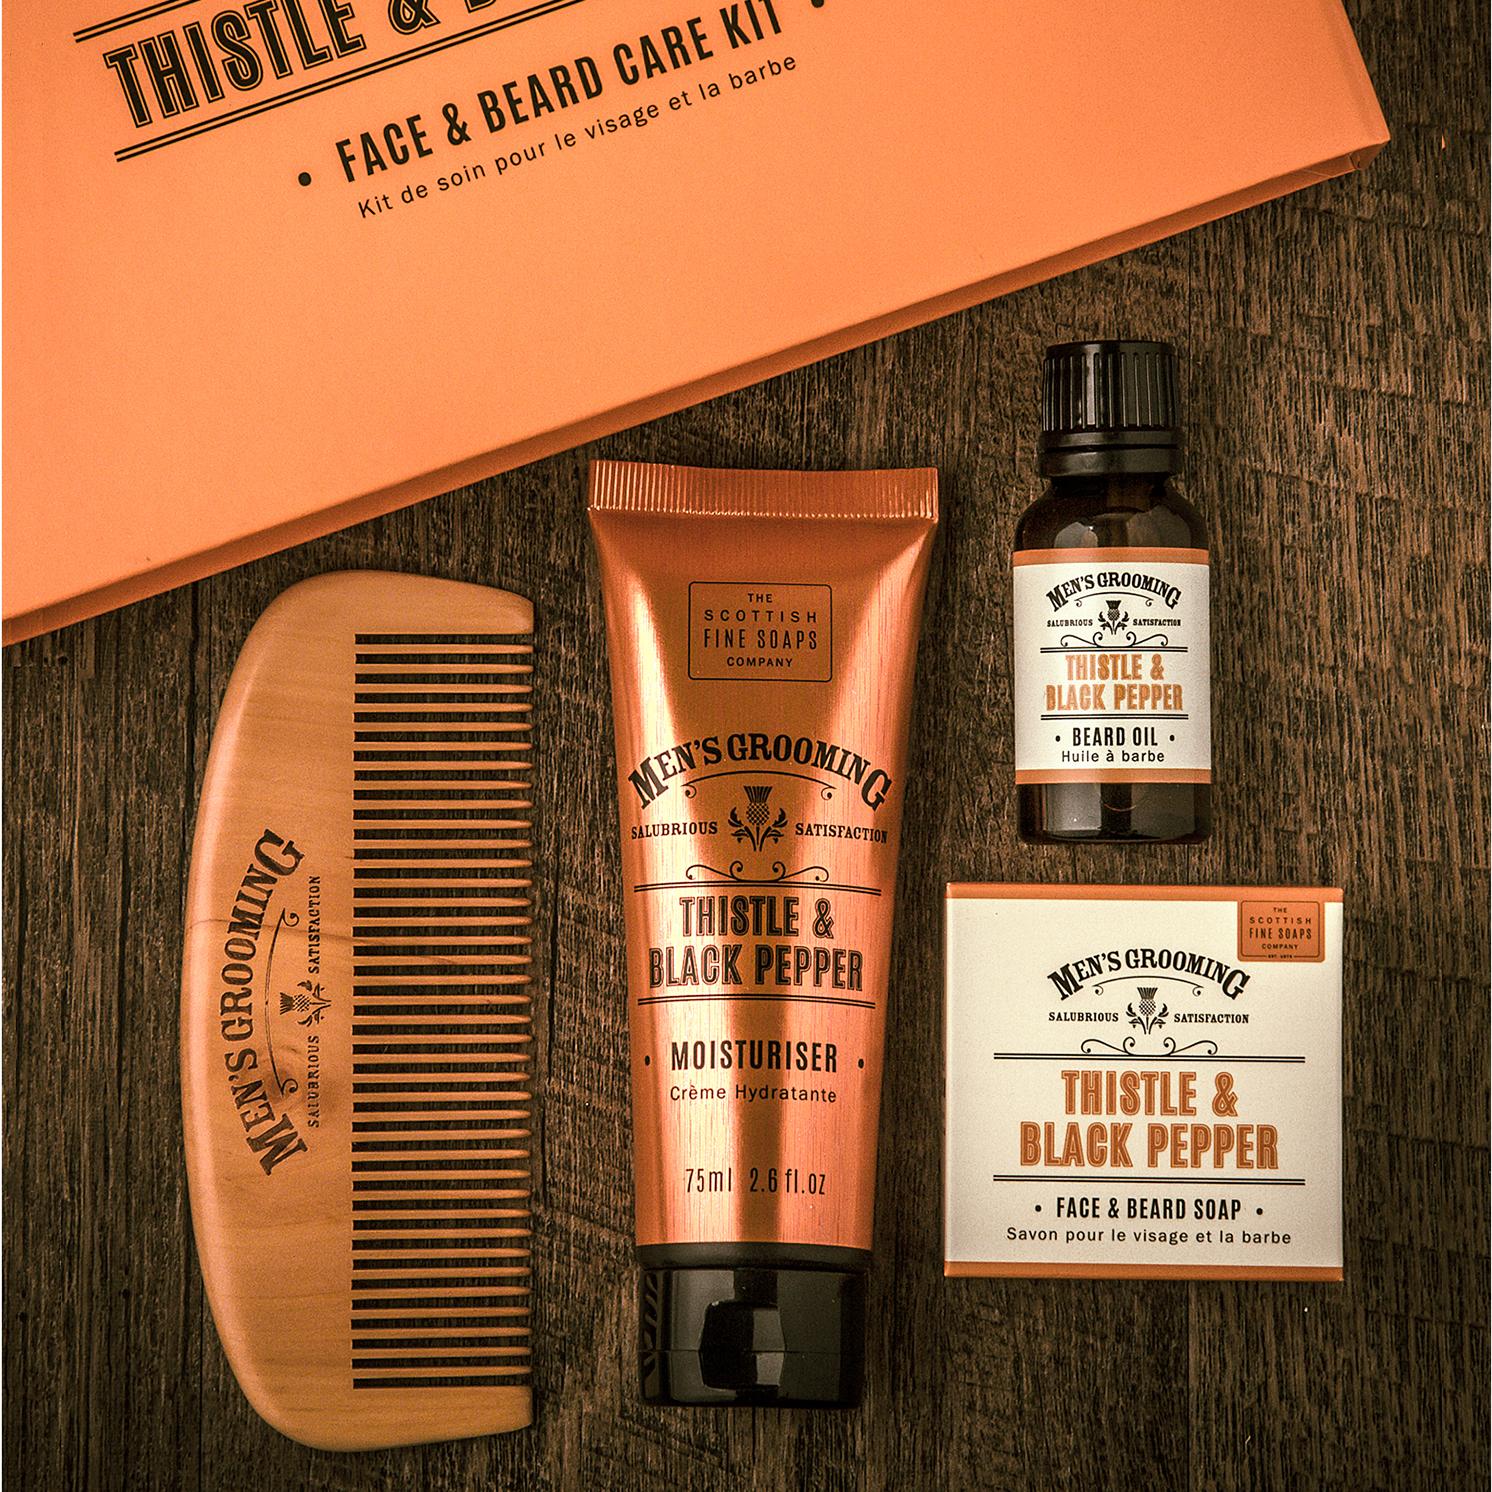 The Scottish Fine Soaps Company – 4 Piece Face & Beard Care Set in Gift Box